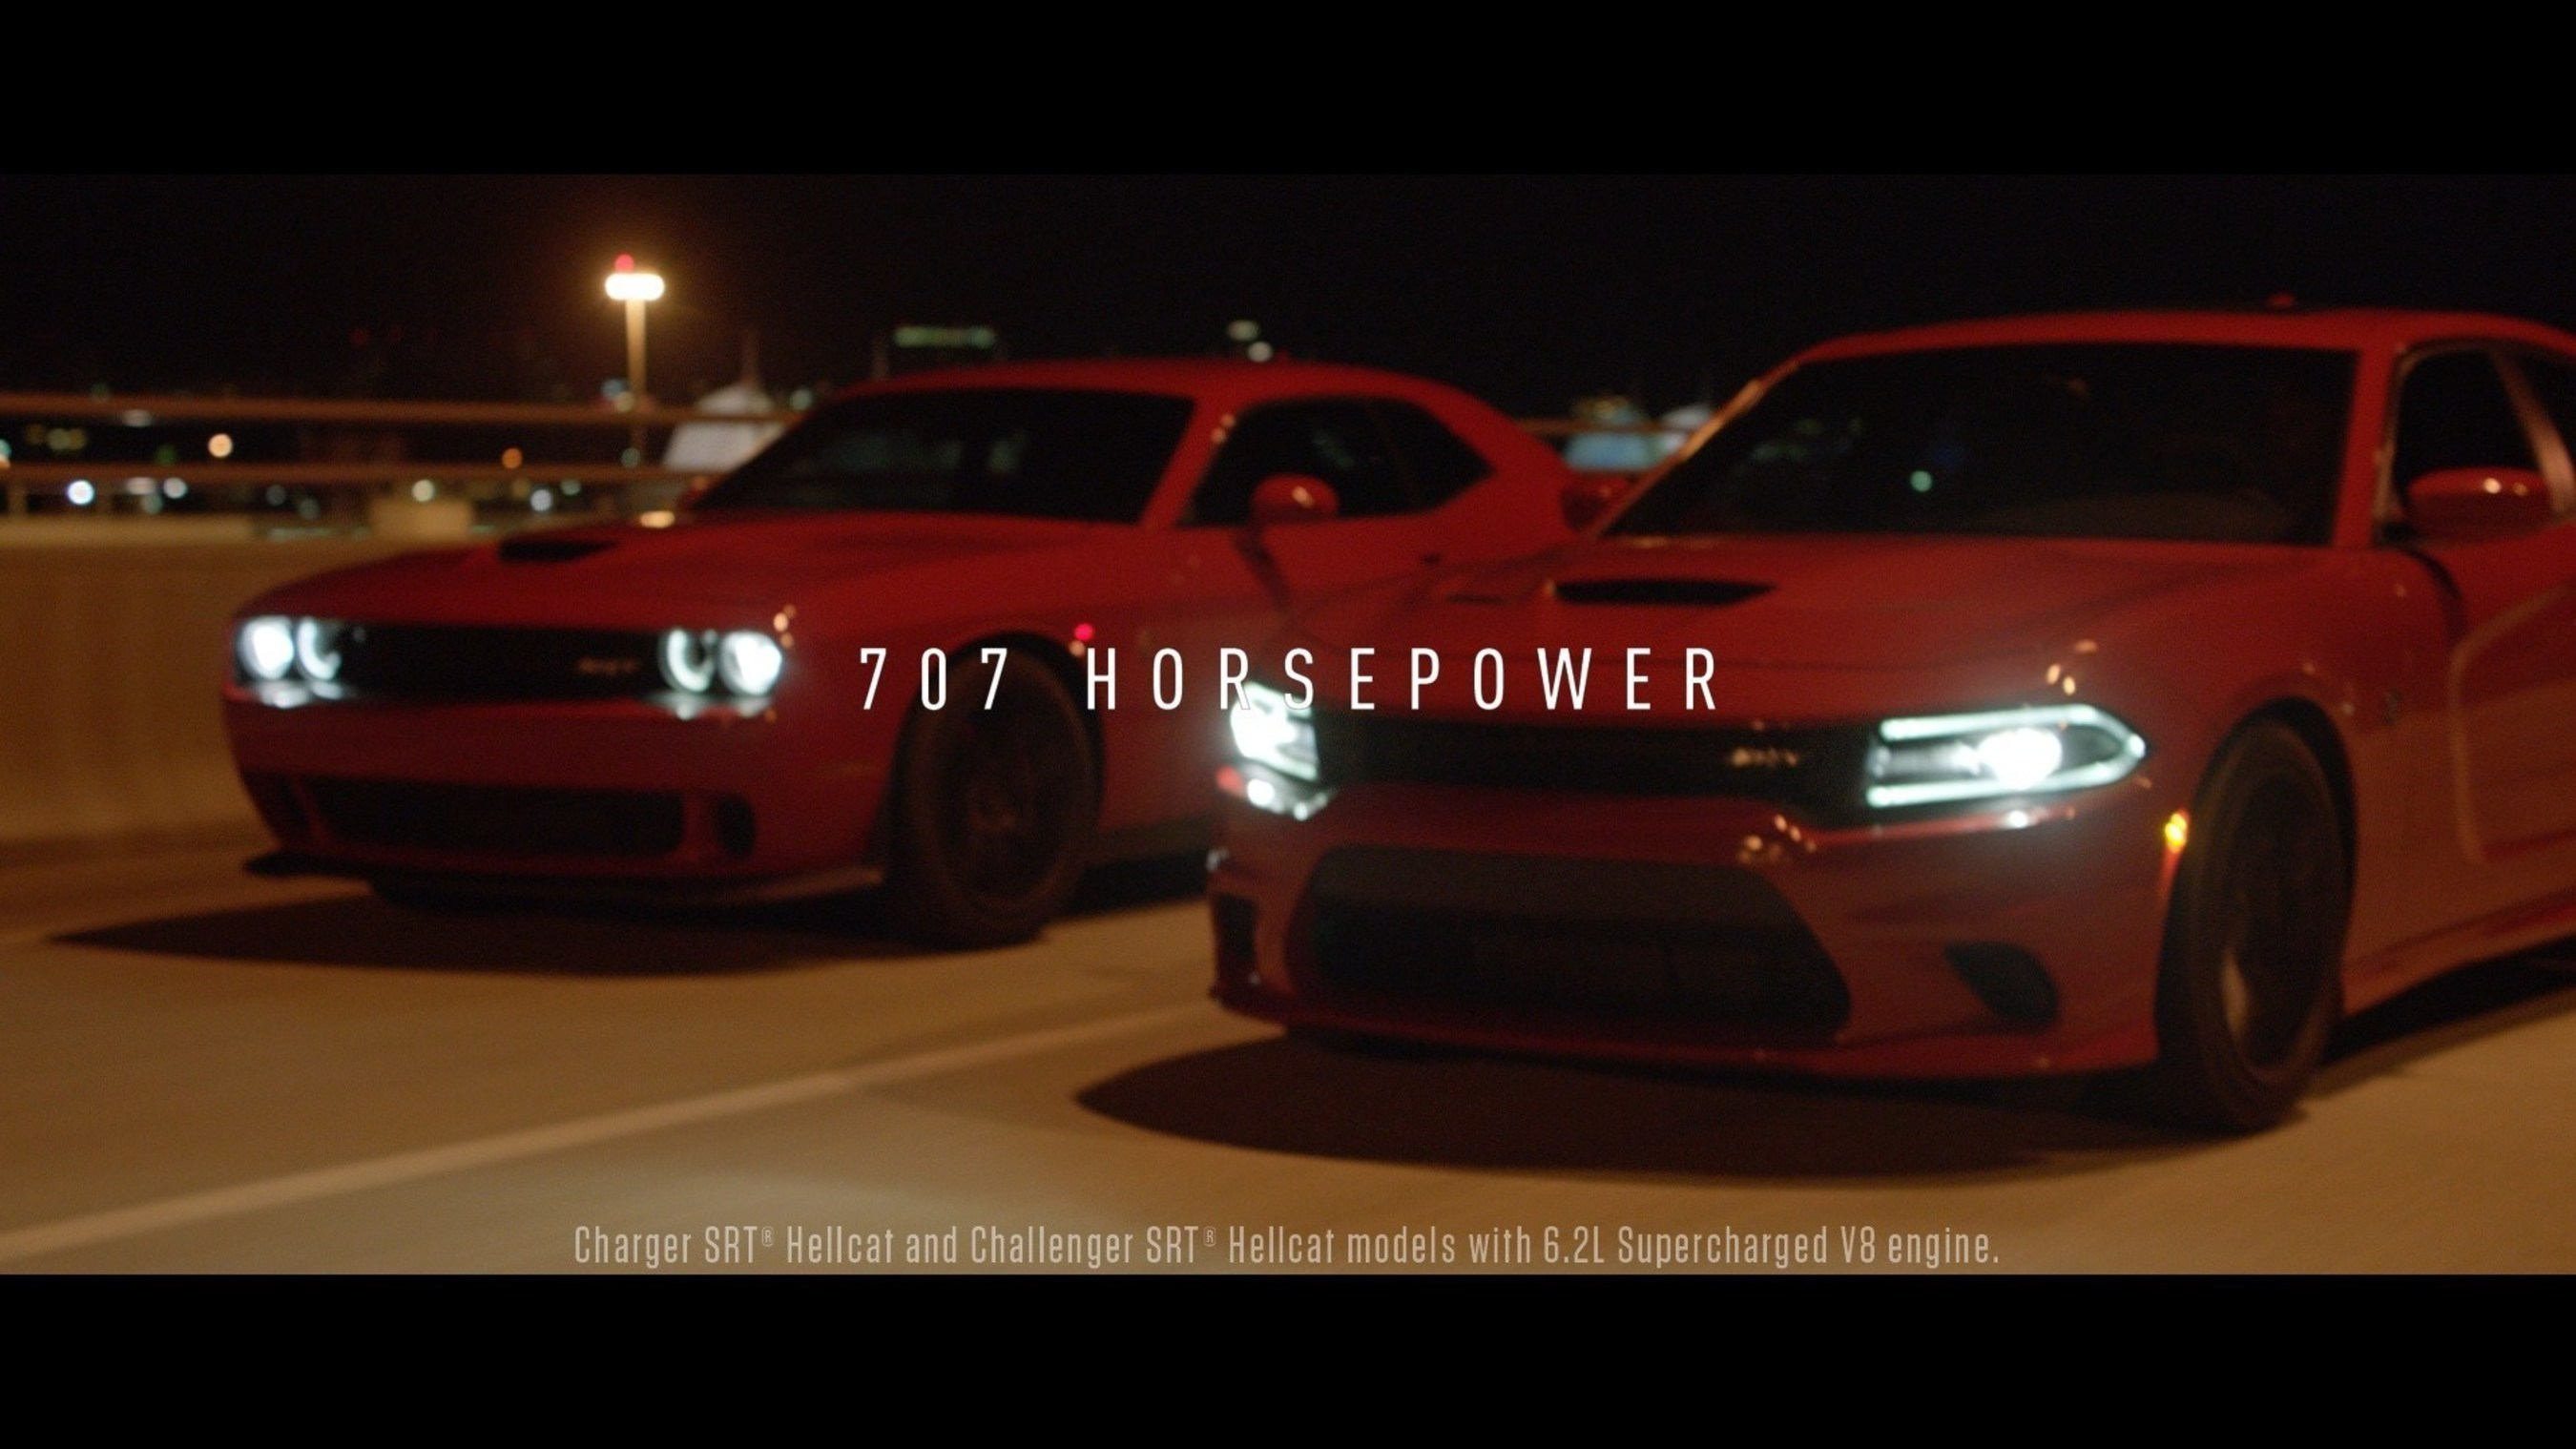 Dodge Brand Halo Vehicles - Dodge Charger SRT Hellcat